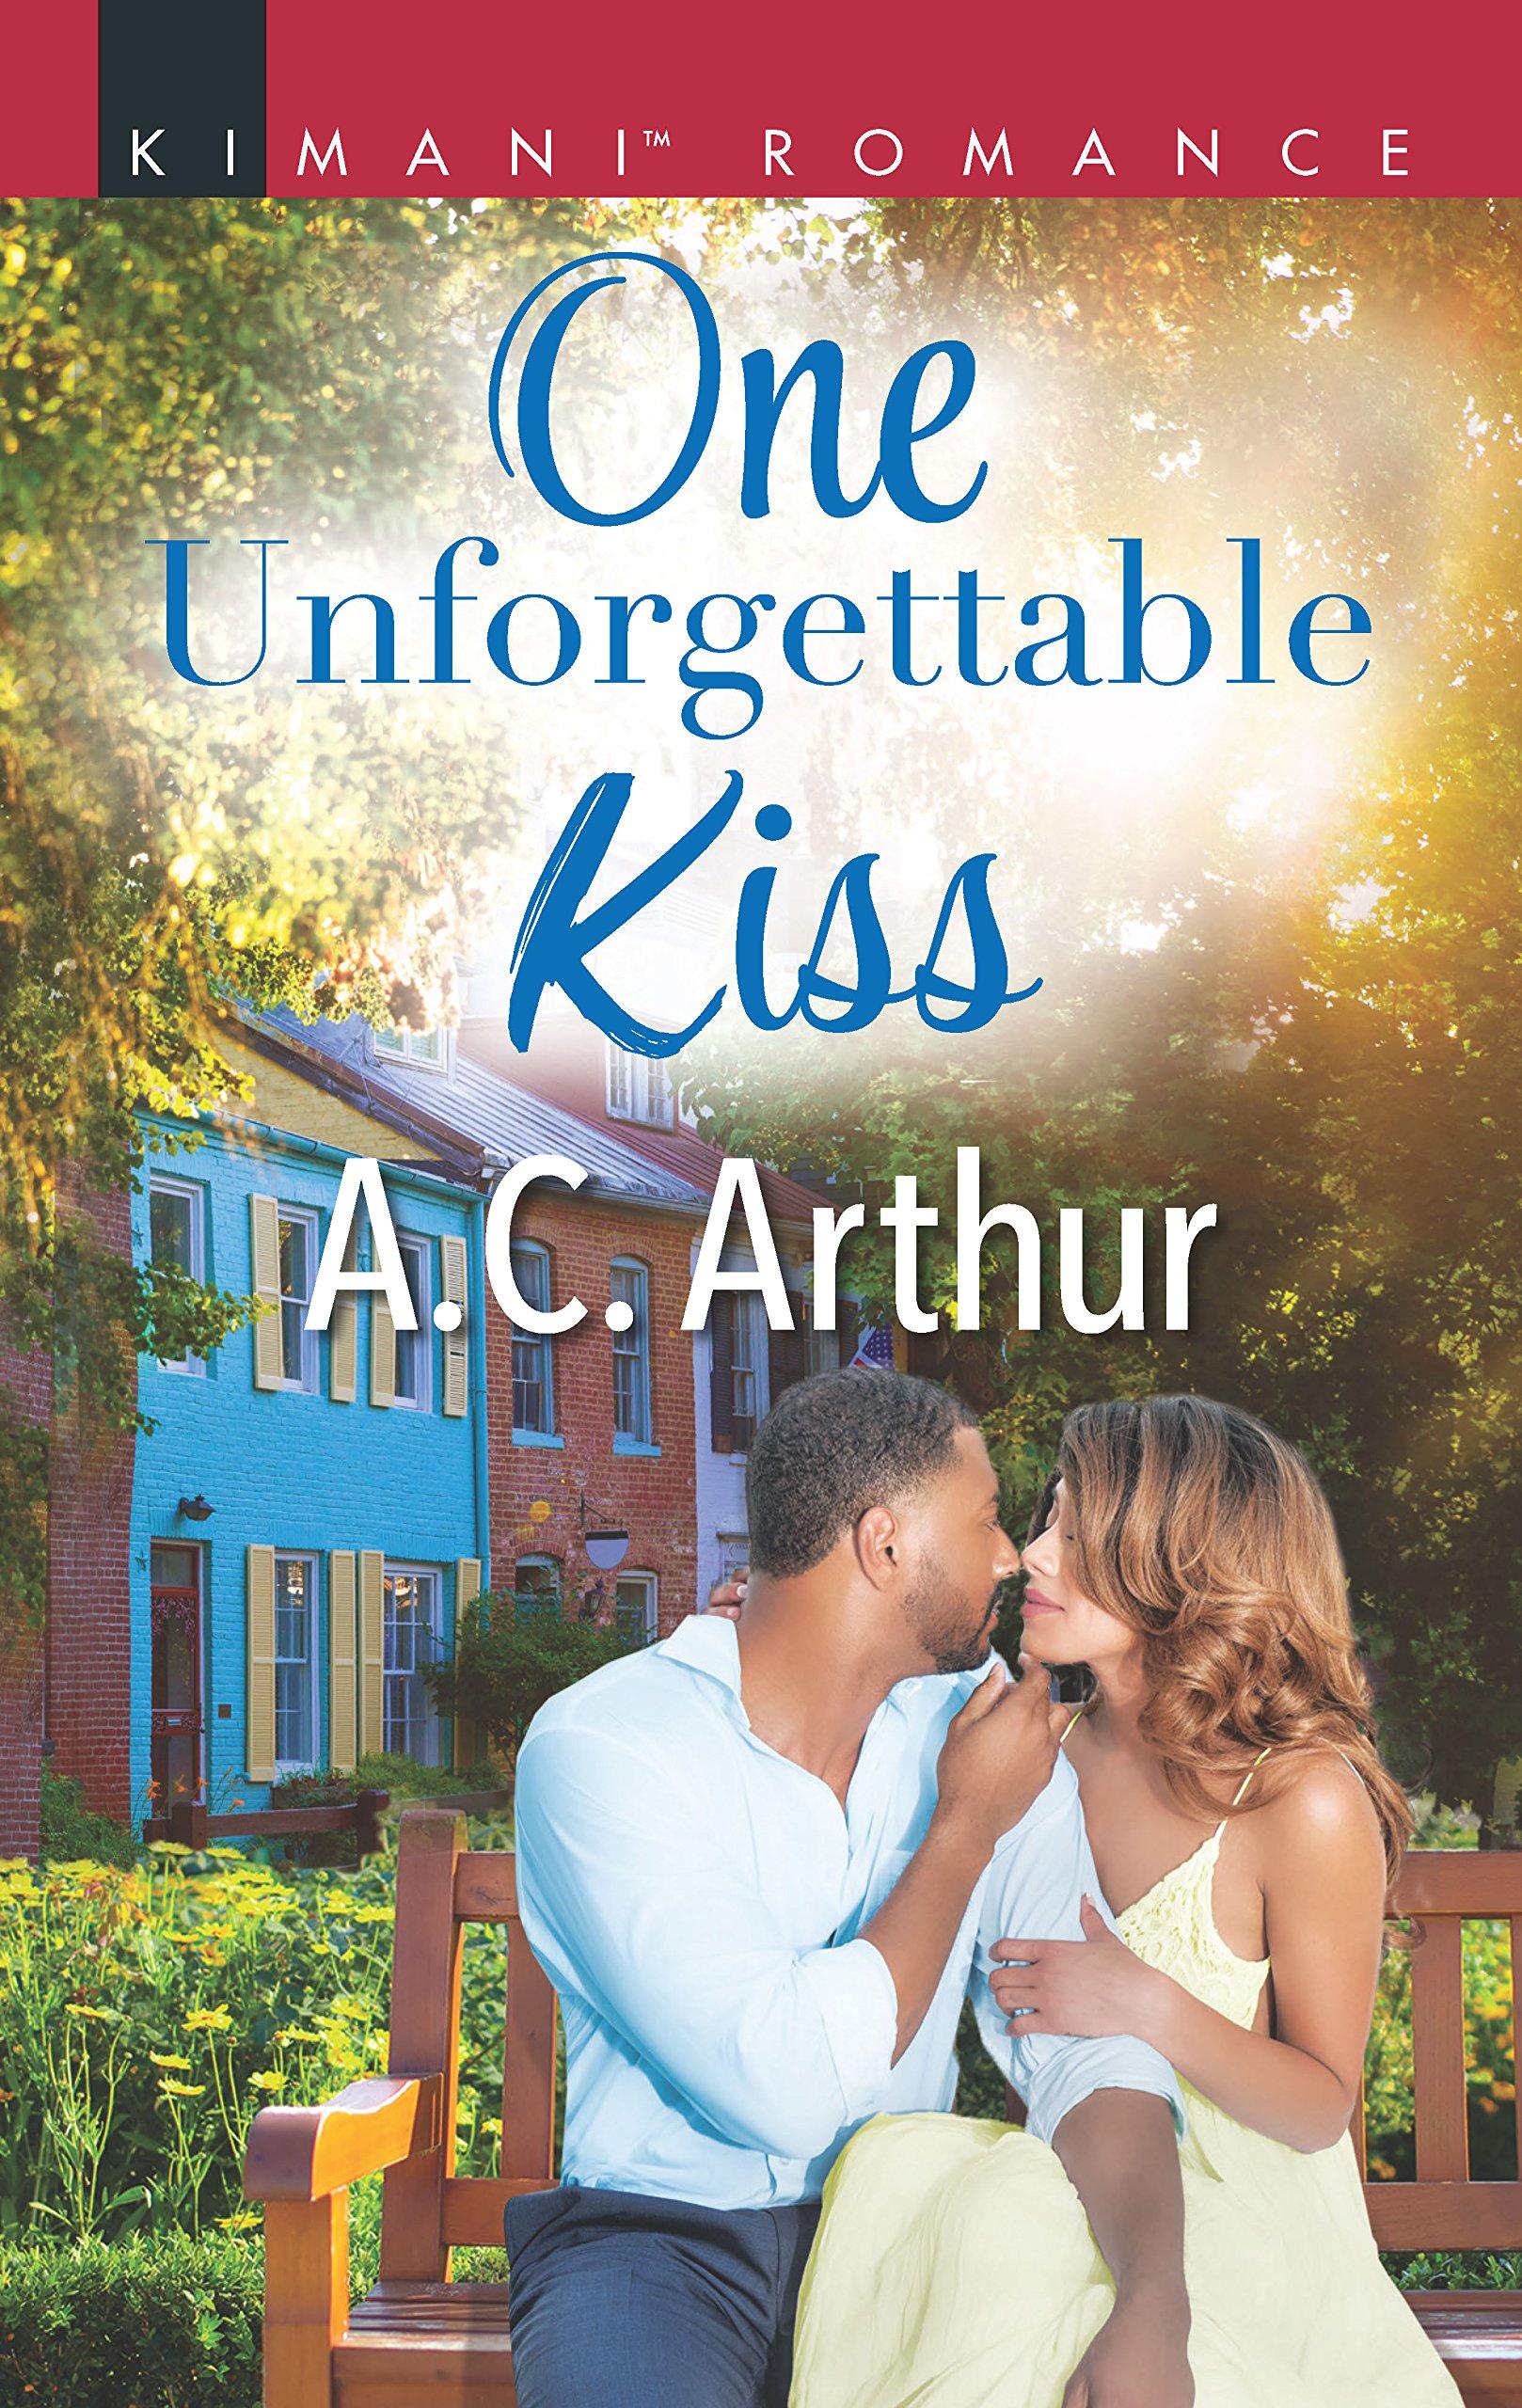 Amazon.com: One Unforgettable Kiss (The Taylors of Temptation)  (9781335216649): A.C. Arthur: Books